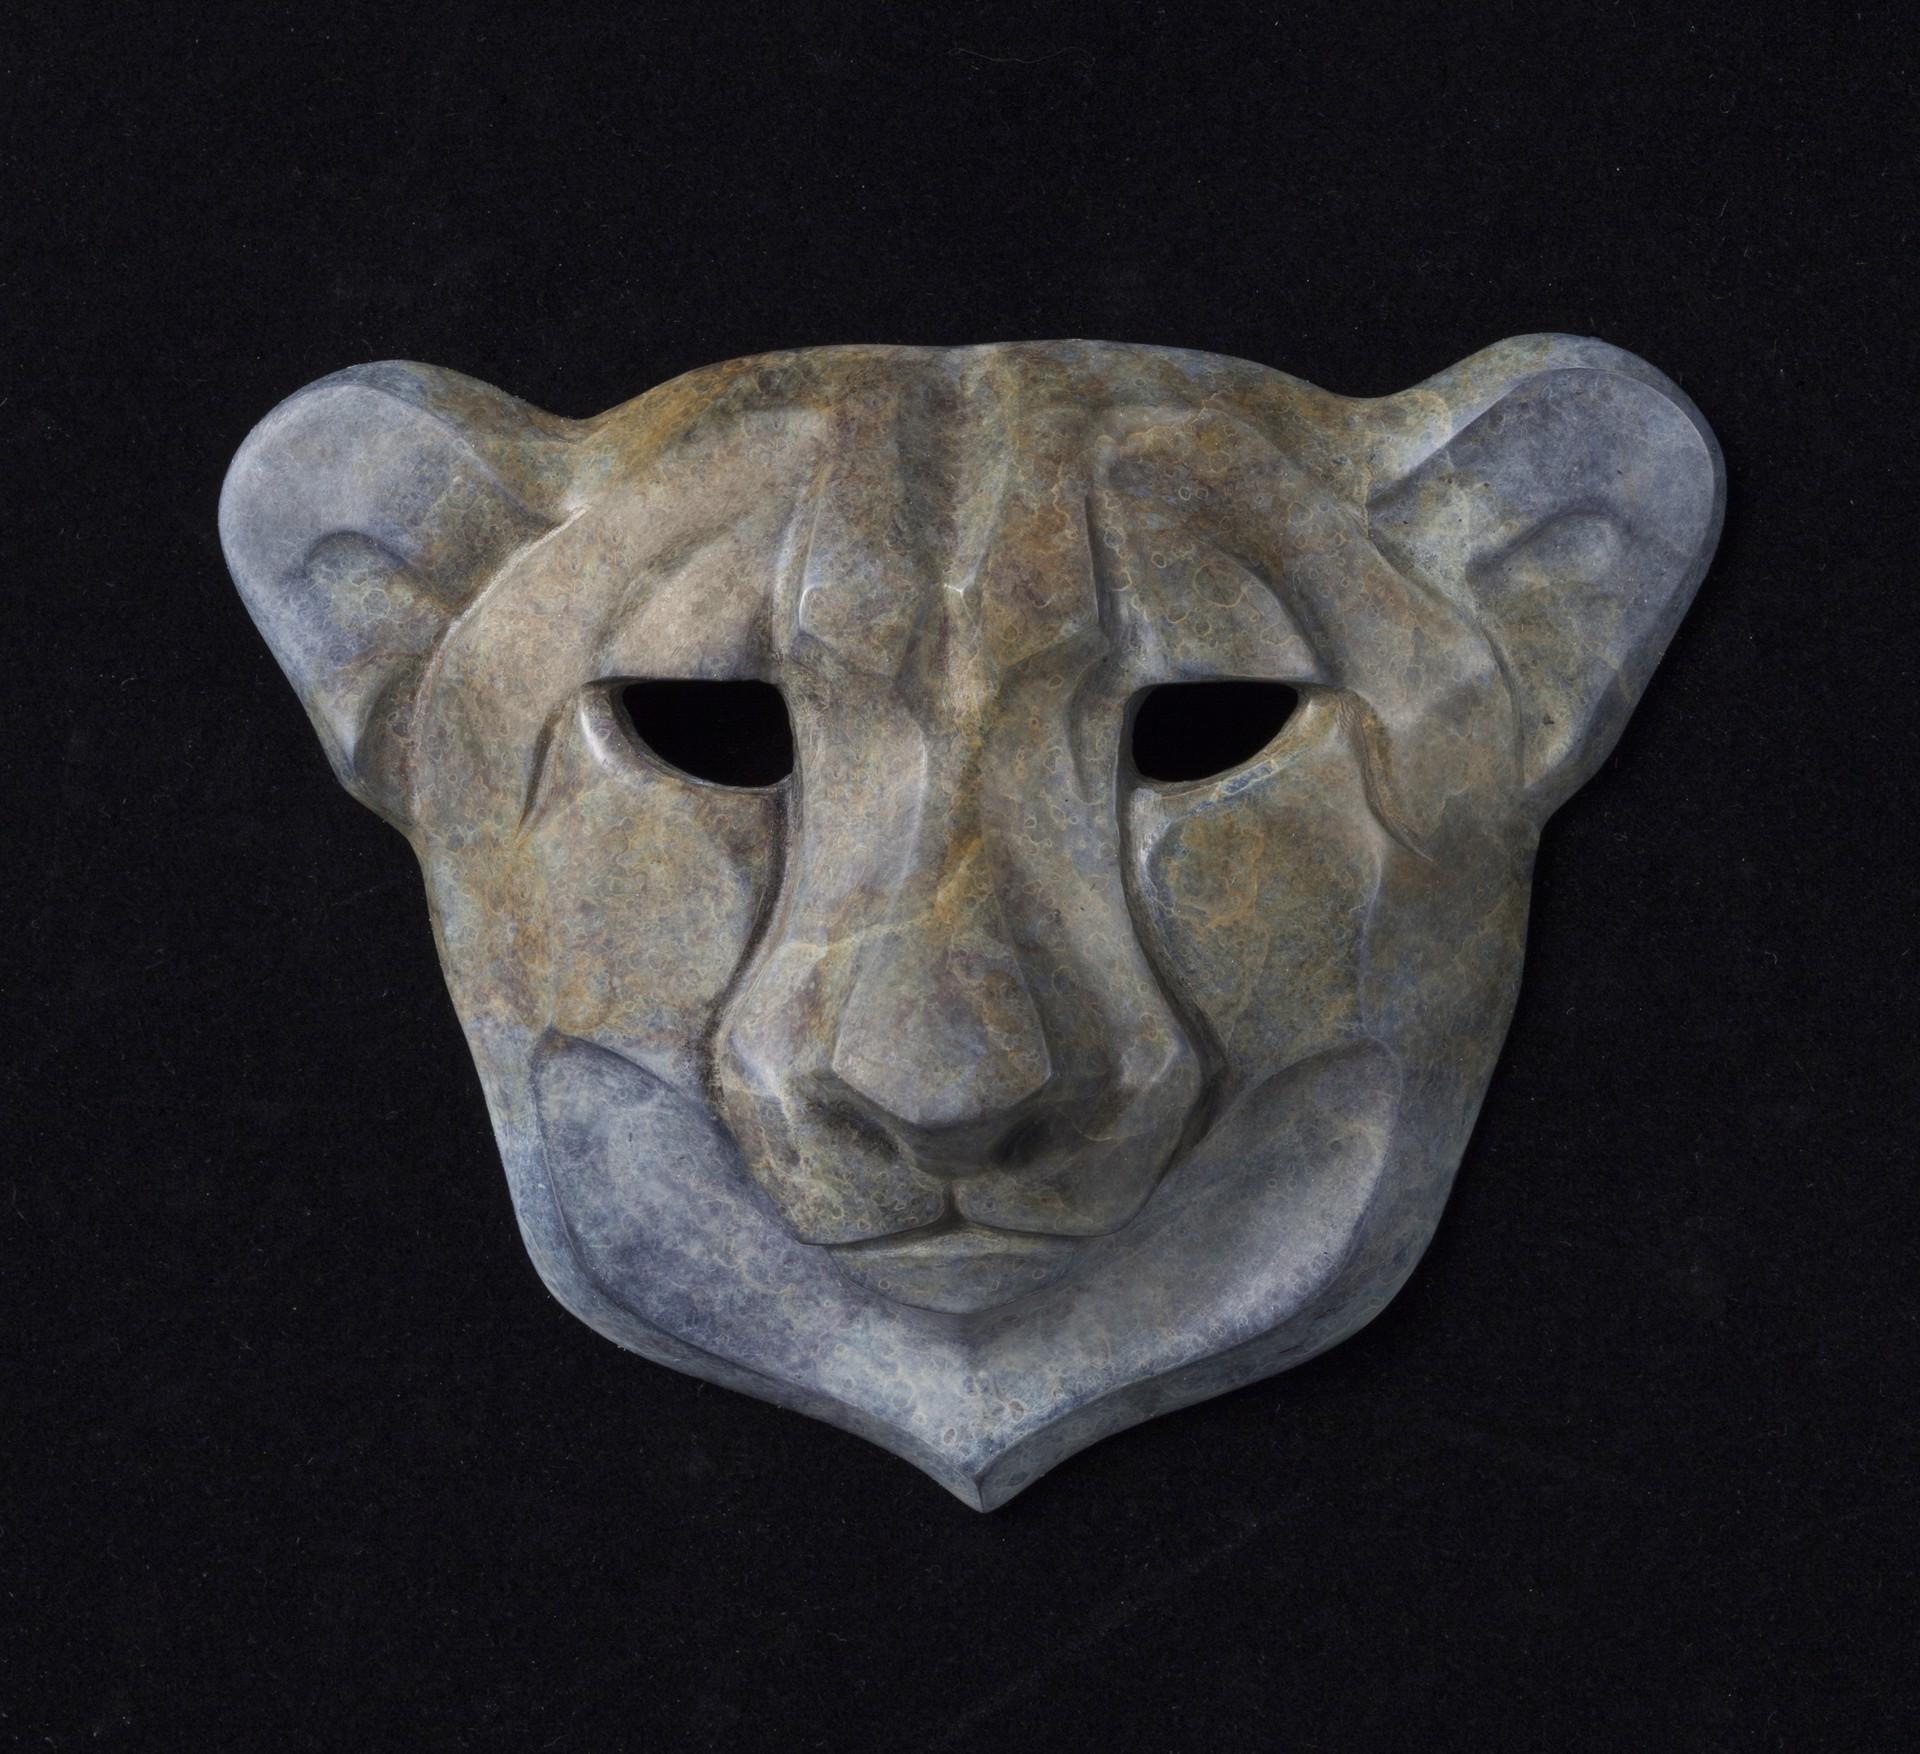 Cheetah Mask Maquette by Rosetta